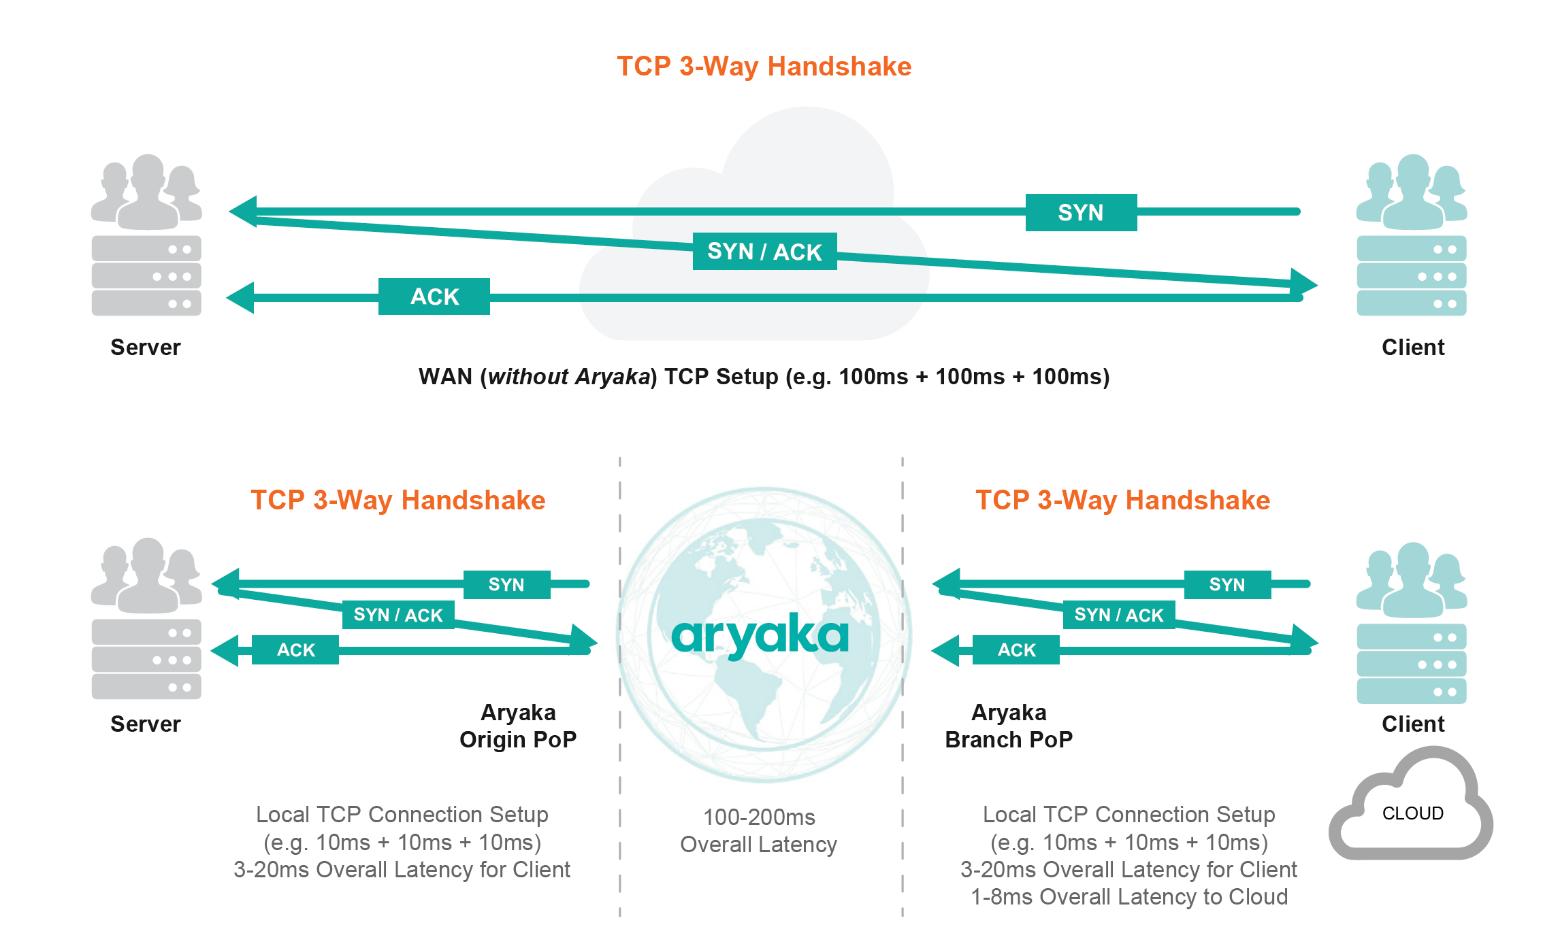 TCP handshake with and without Aryaka